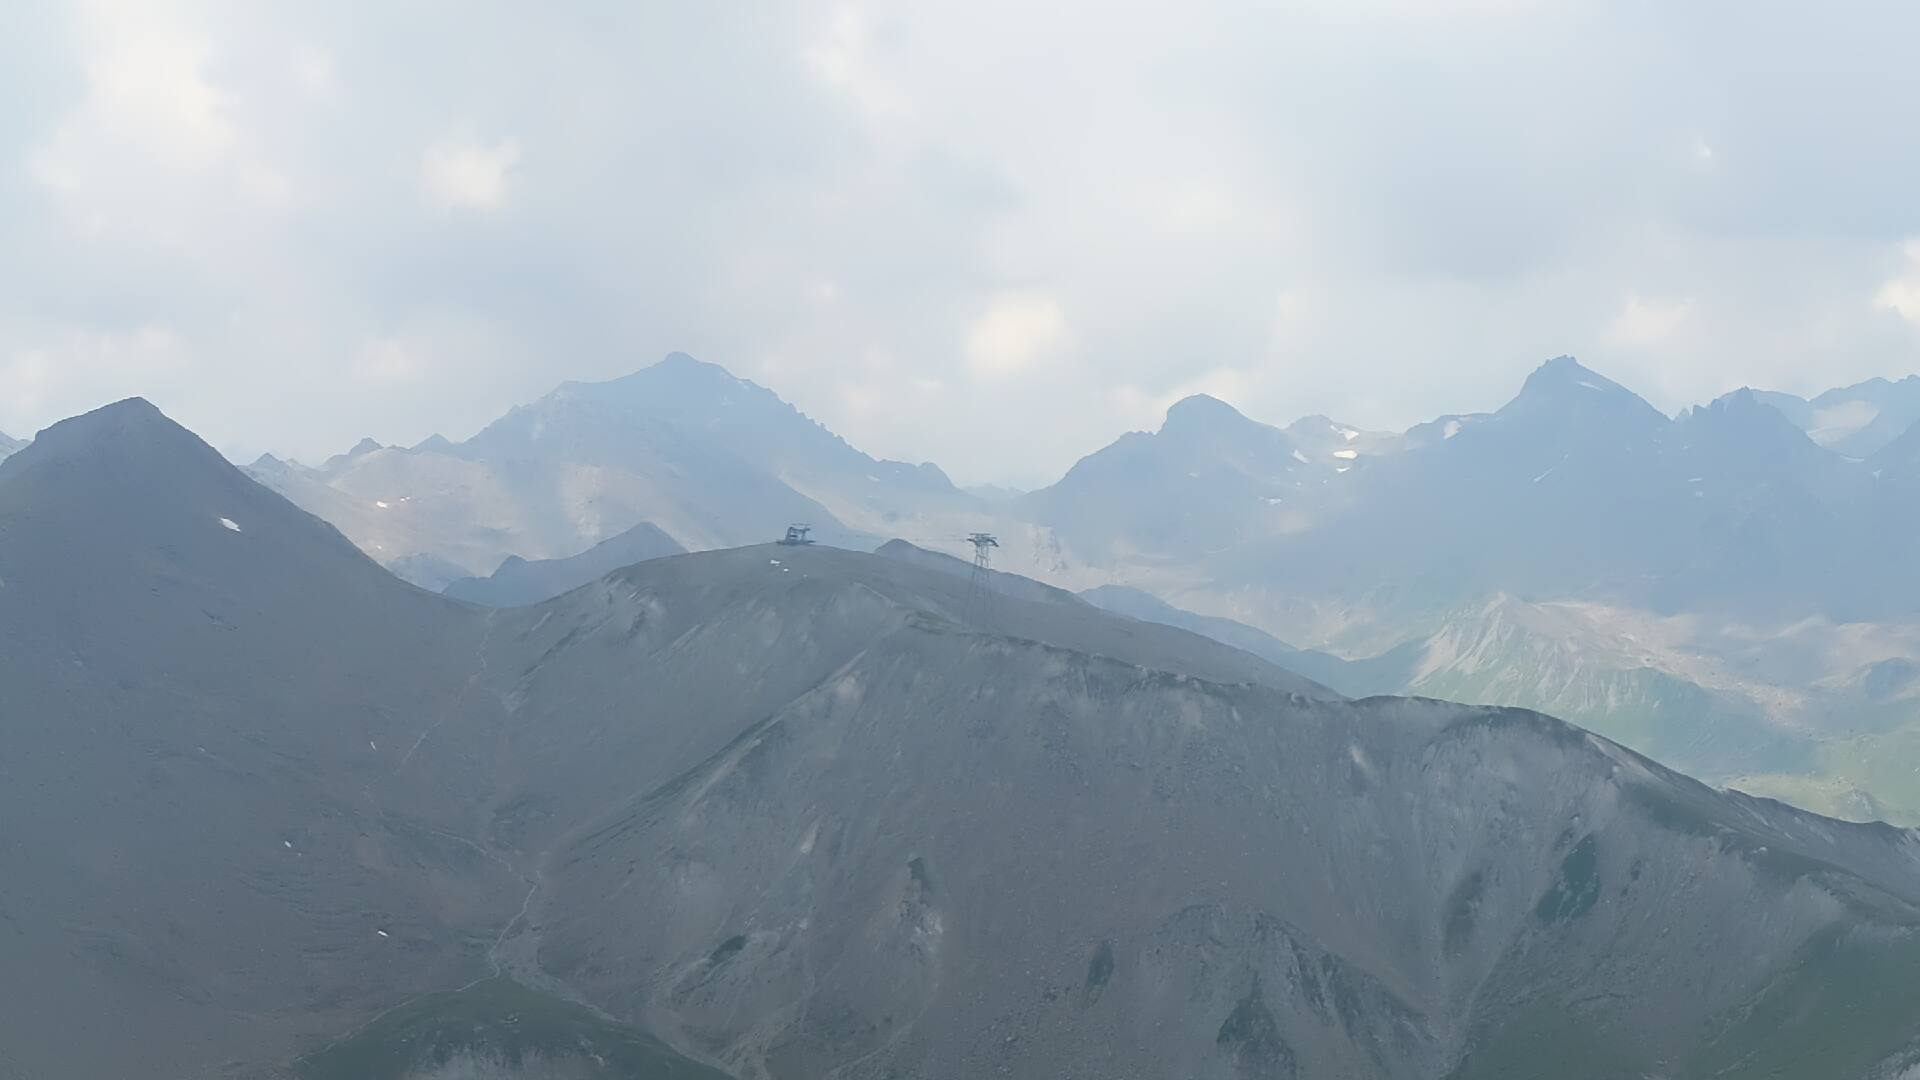 Samnaun - Ischgl webcam - Piz Val Grodna 2.812 m